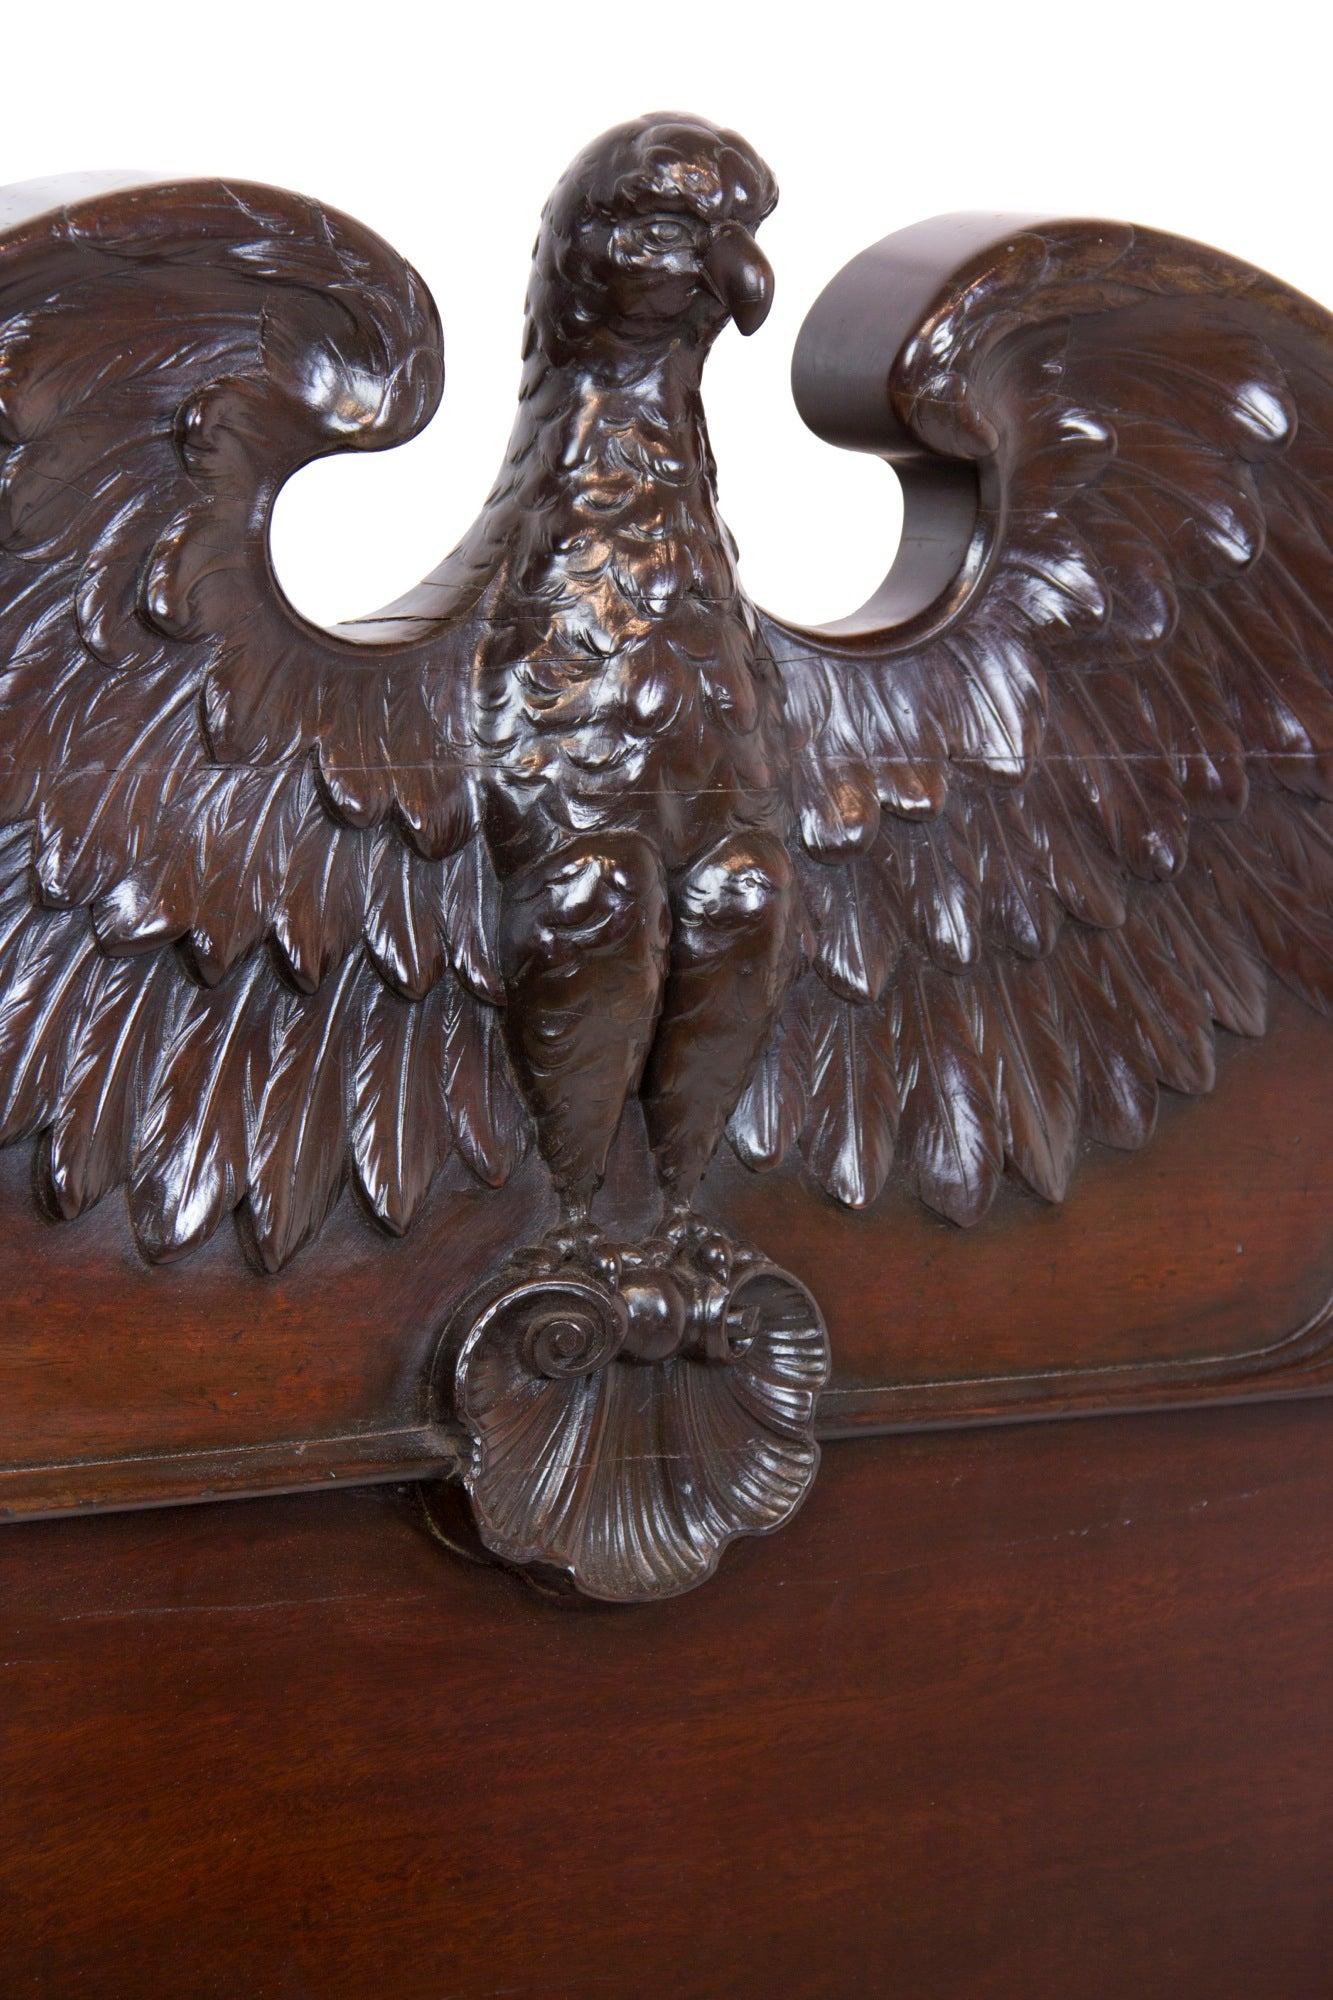 Grand Mahogany Classical Bed With Eagle Headboard, Southern, Circa 1830 1840